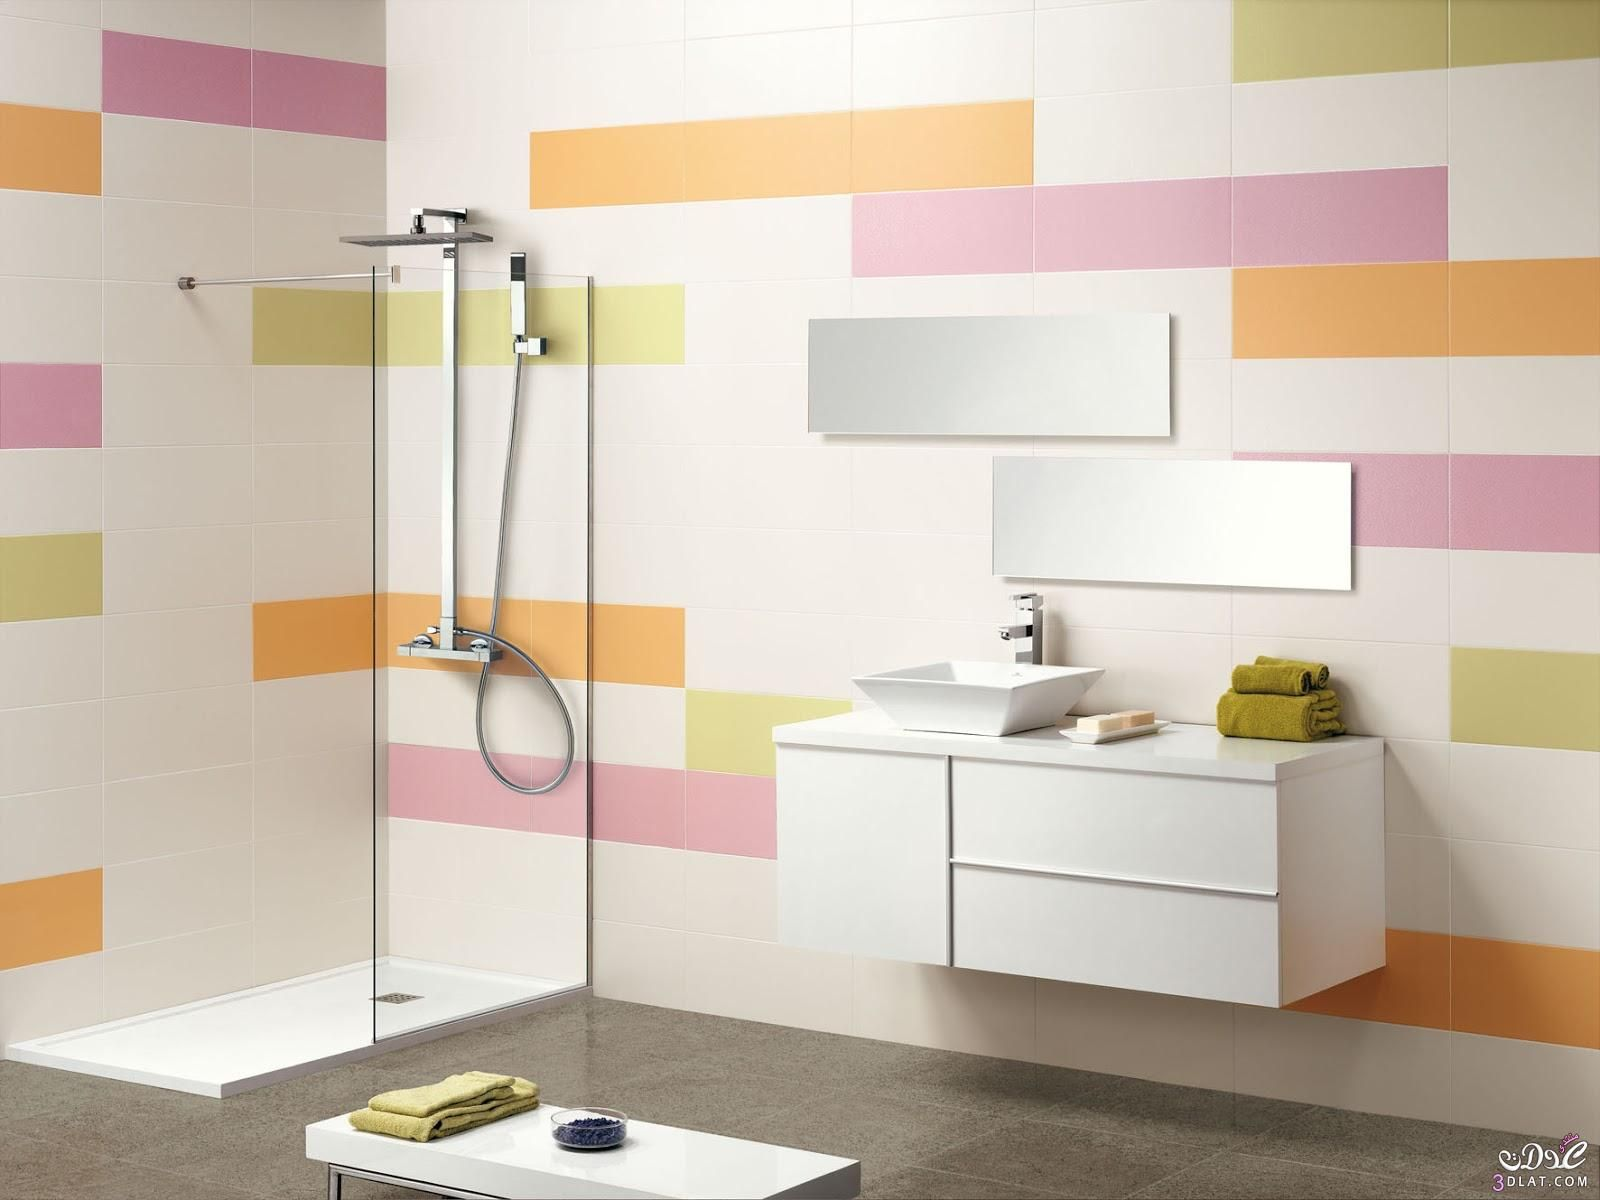 انواع سيراميك فخمه سراميك 2018 احدث تشكيلات صور سيراميك حمامات جديده اشكال Home Decor Room Divider Bathroom Shower